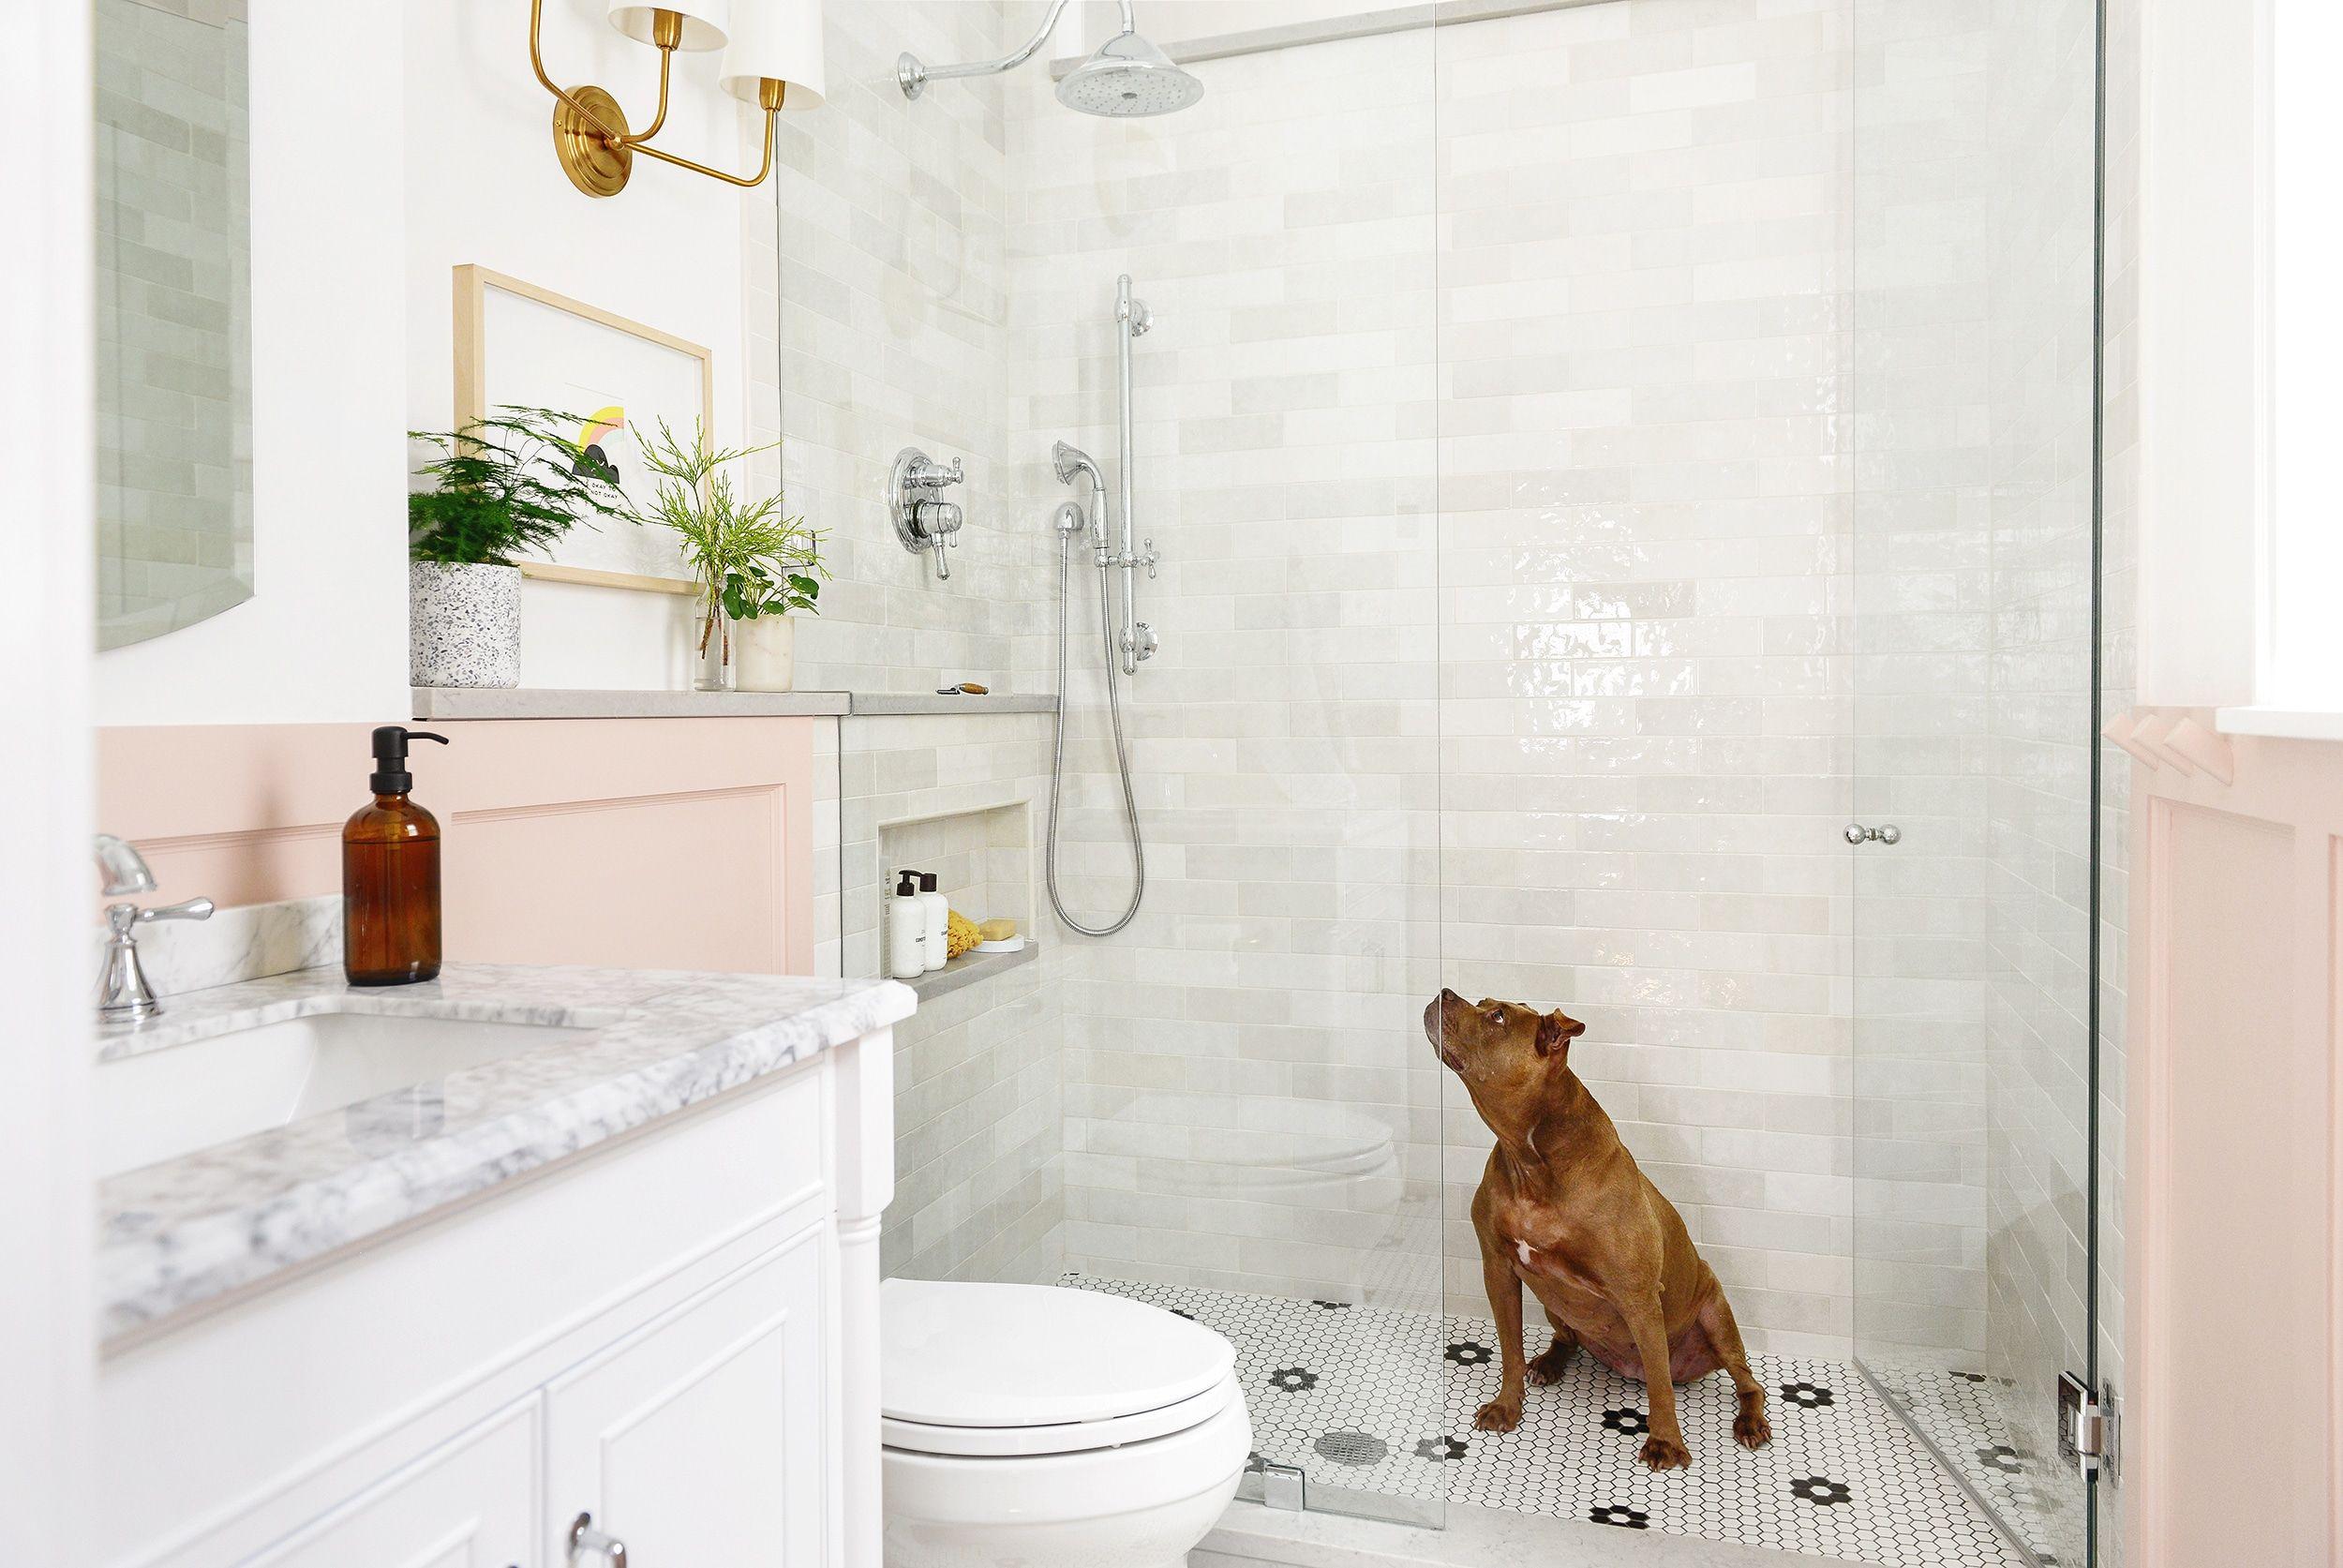 Yellow Brick Home Does A Bathroom Renovation Increase A Home S Roi Bathroom Renovation Walk In Shower Designs Small Bathroom